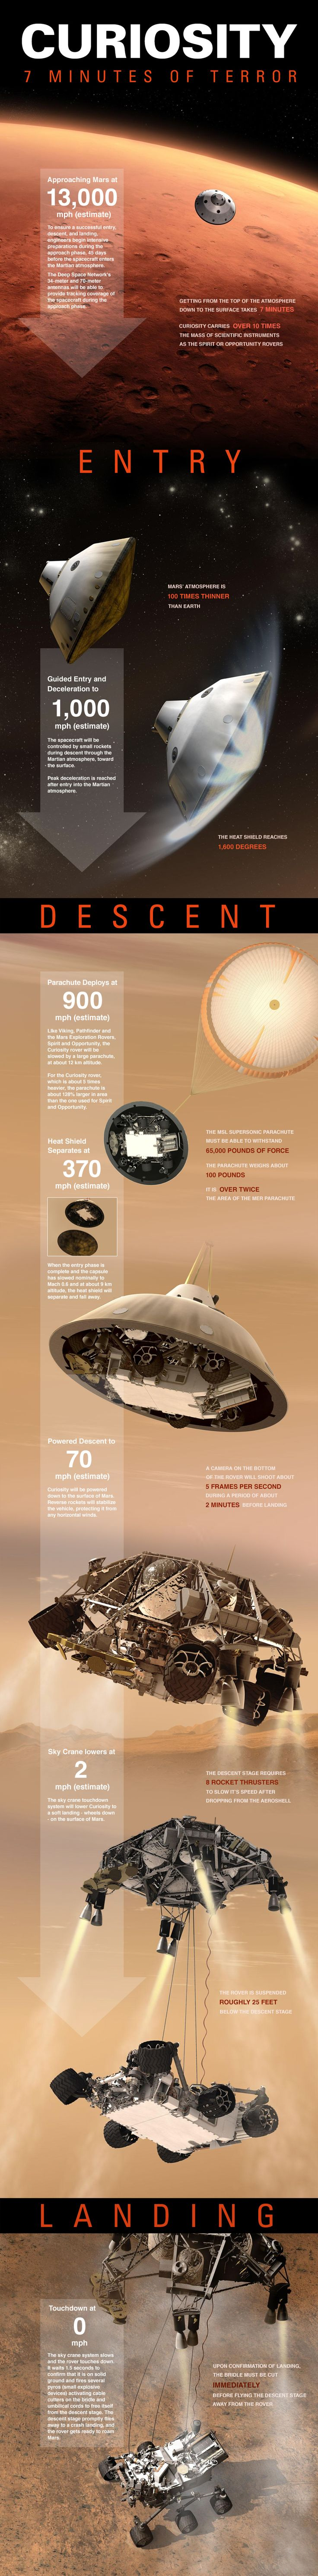 Curiosity - 7 Minutes of Terror - NASA Jet Propulsion Laboratory #infographic